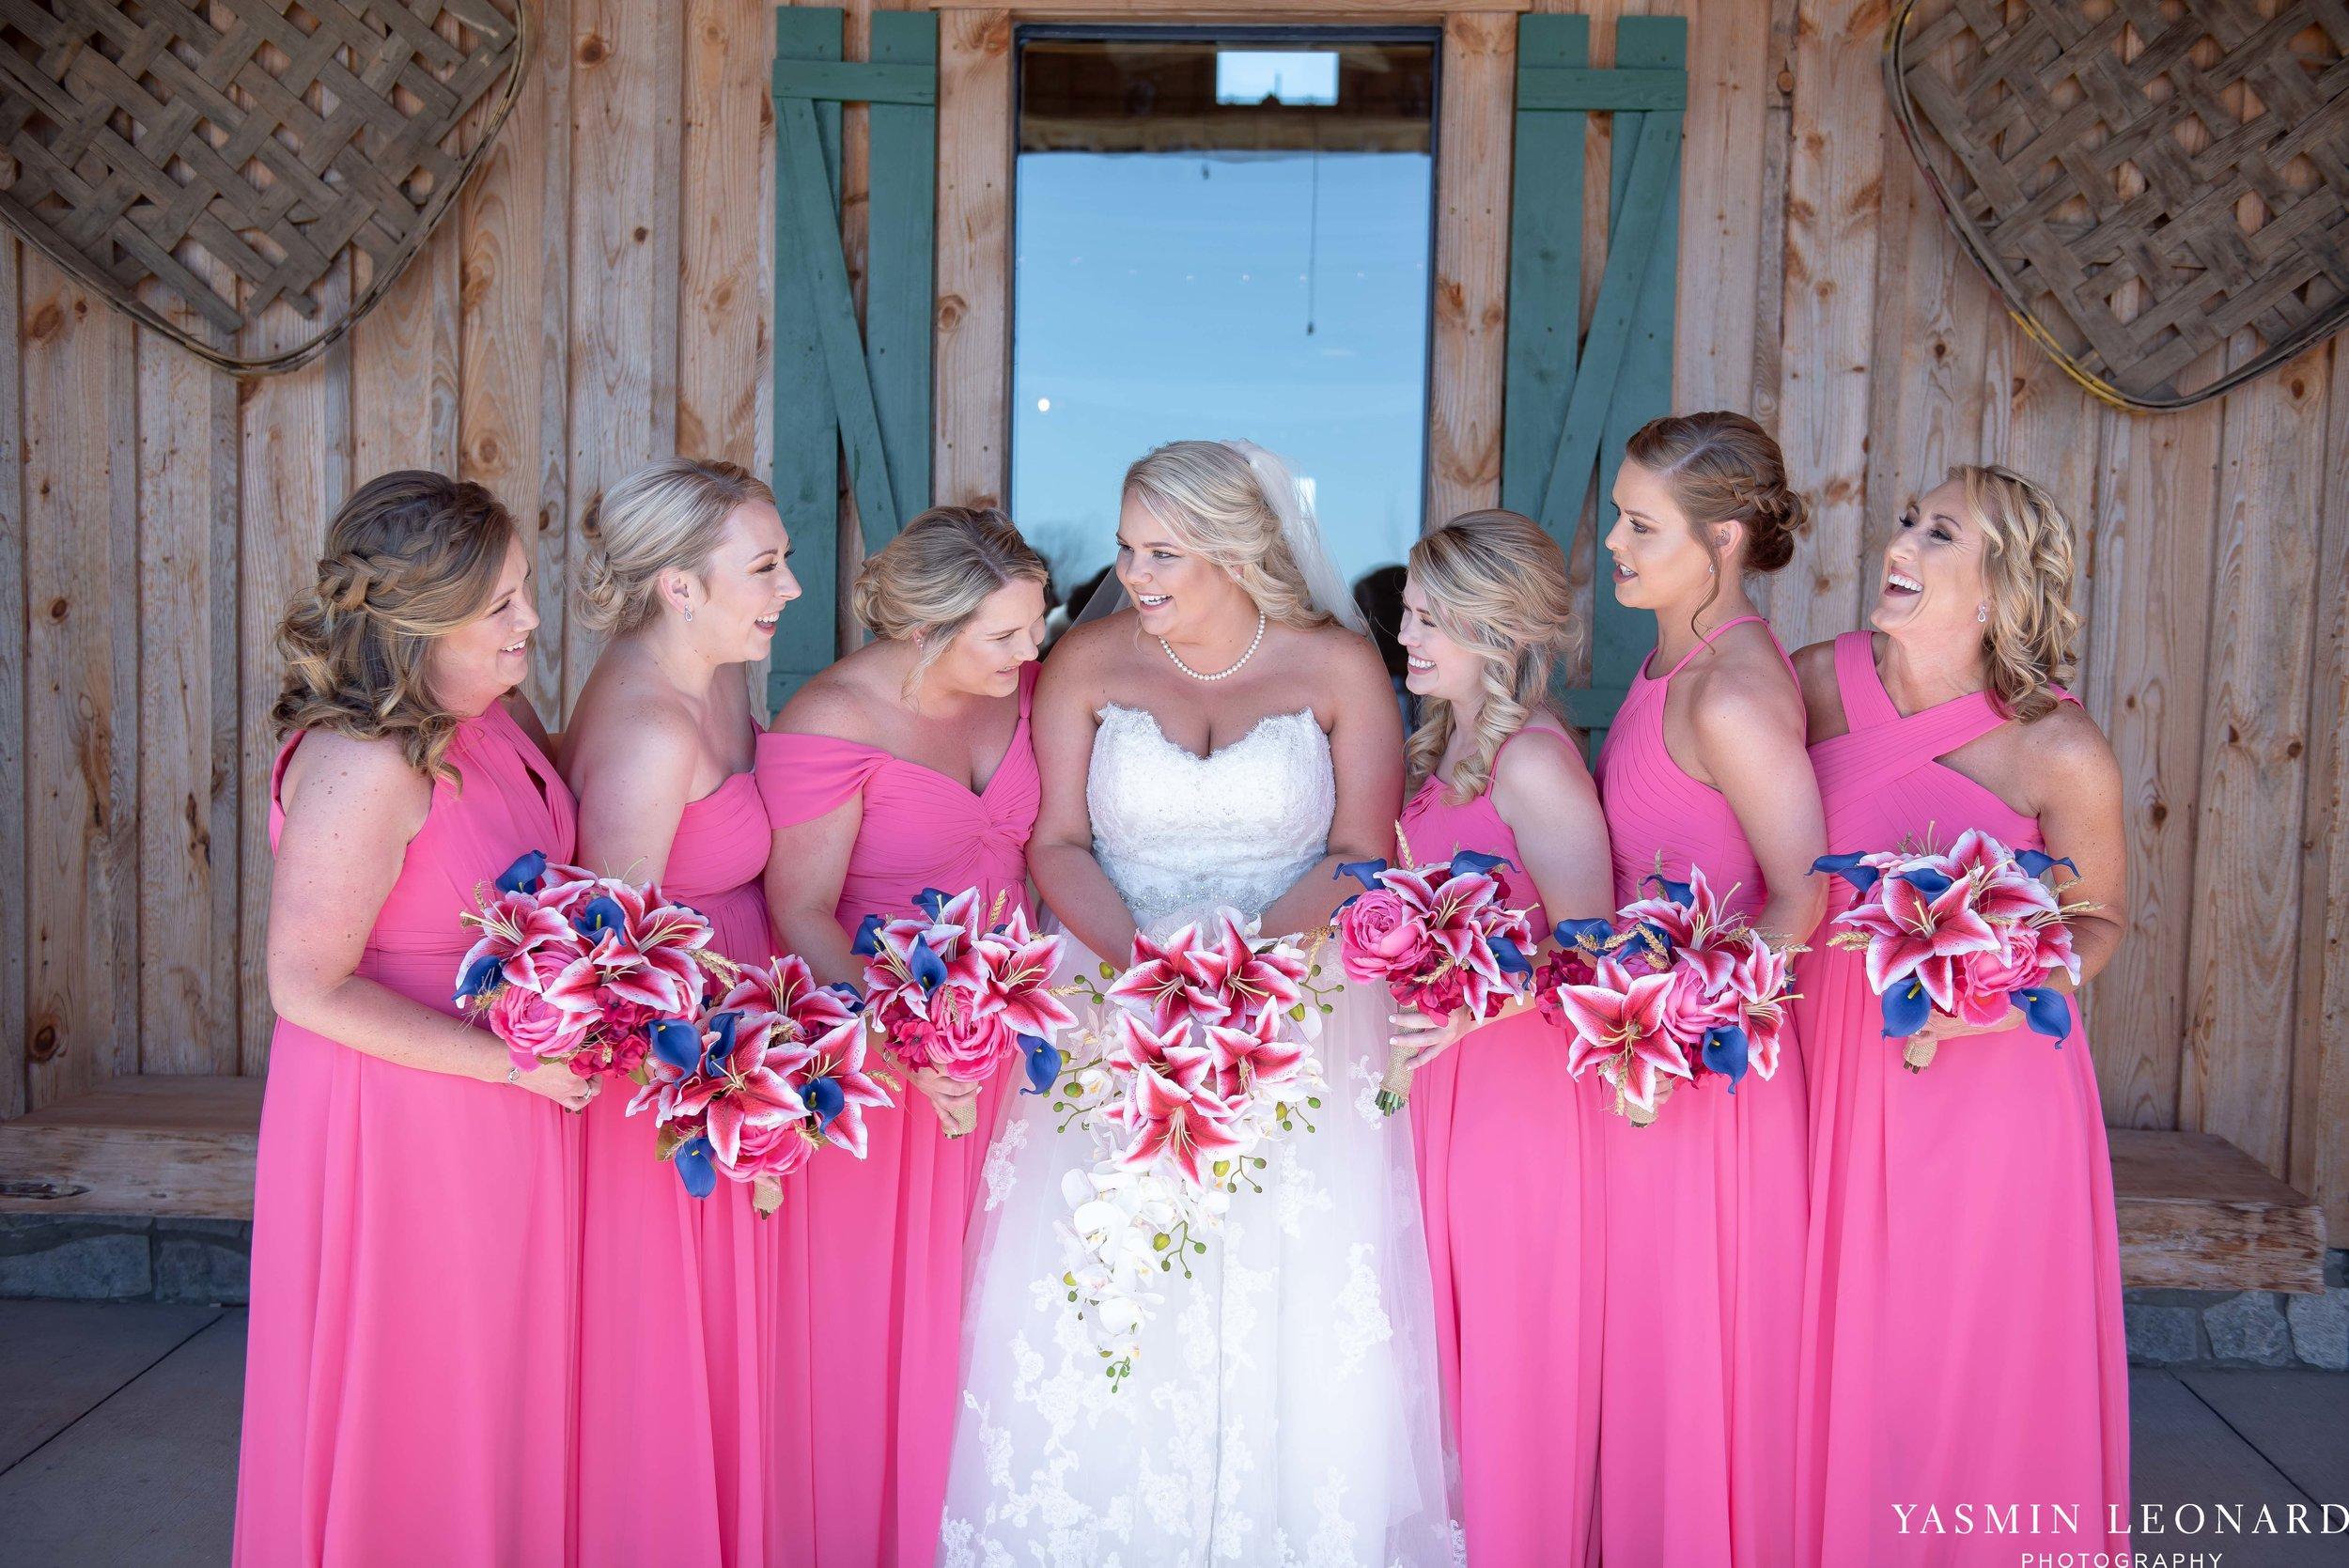 The Barn at Heritage Farm - Country Wedding - Pink and Blue Wedding - Barn Wedding - Outdoor Wedding - Cotton and Wheat Decor - Groom in Bibs - Pink Bridal Colors - Yasmin Leonard Photography-8.jpg